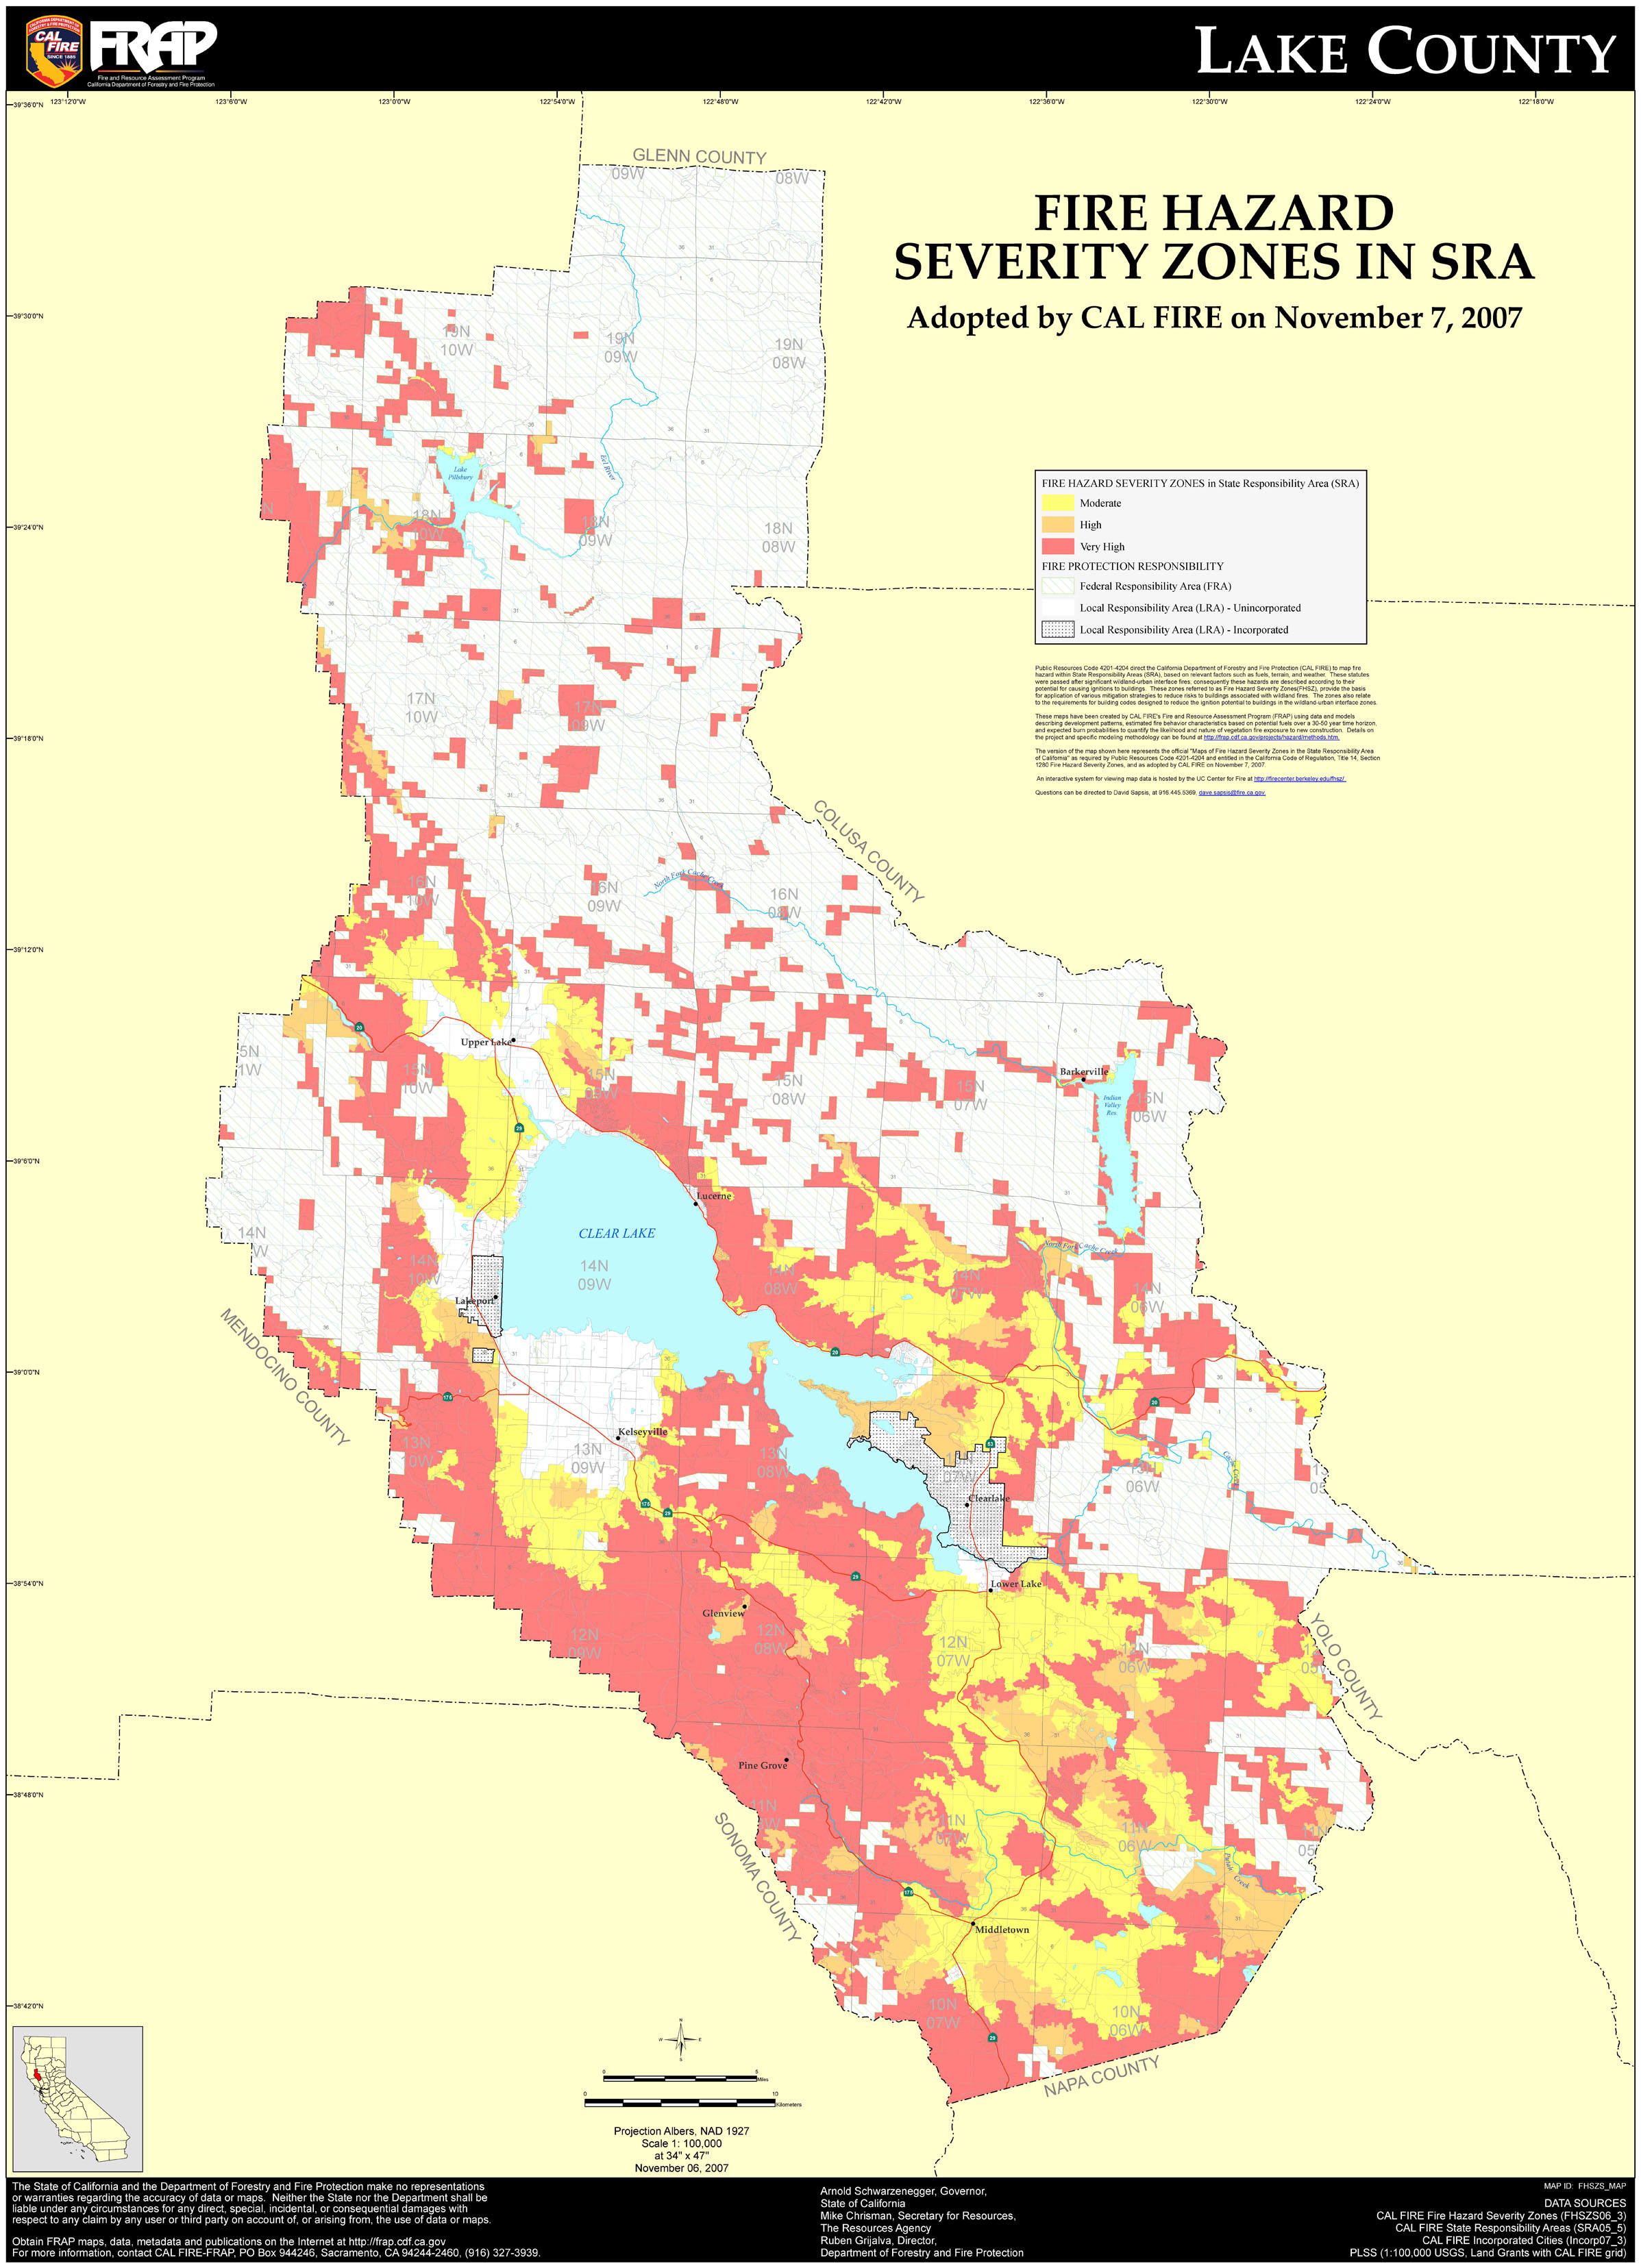 California Fire Map Google - Klipy - State Of California Fire Map